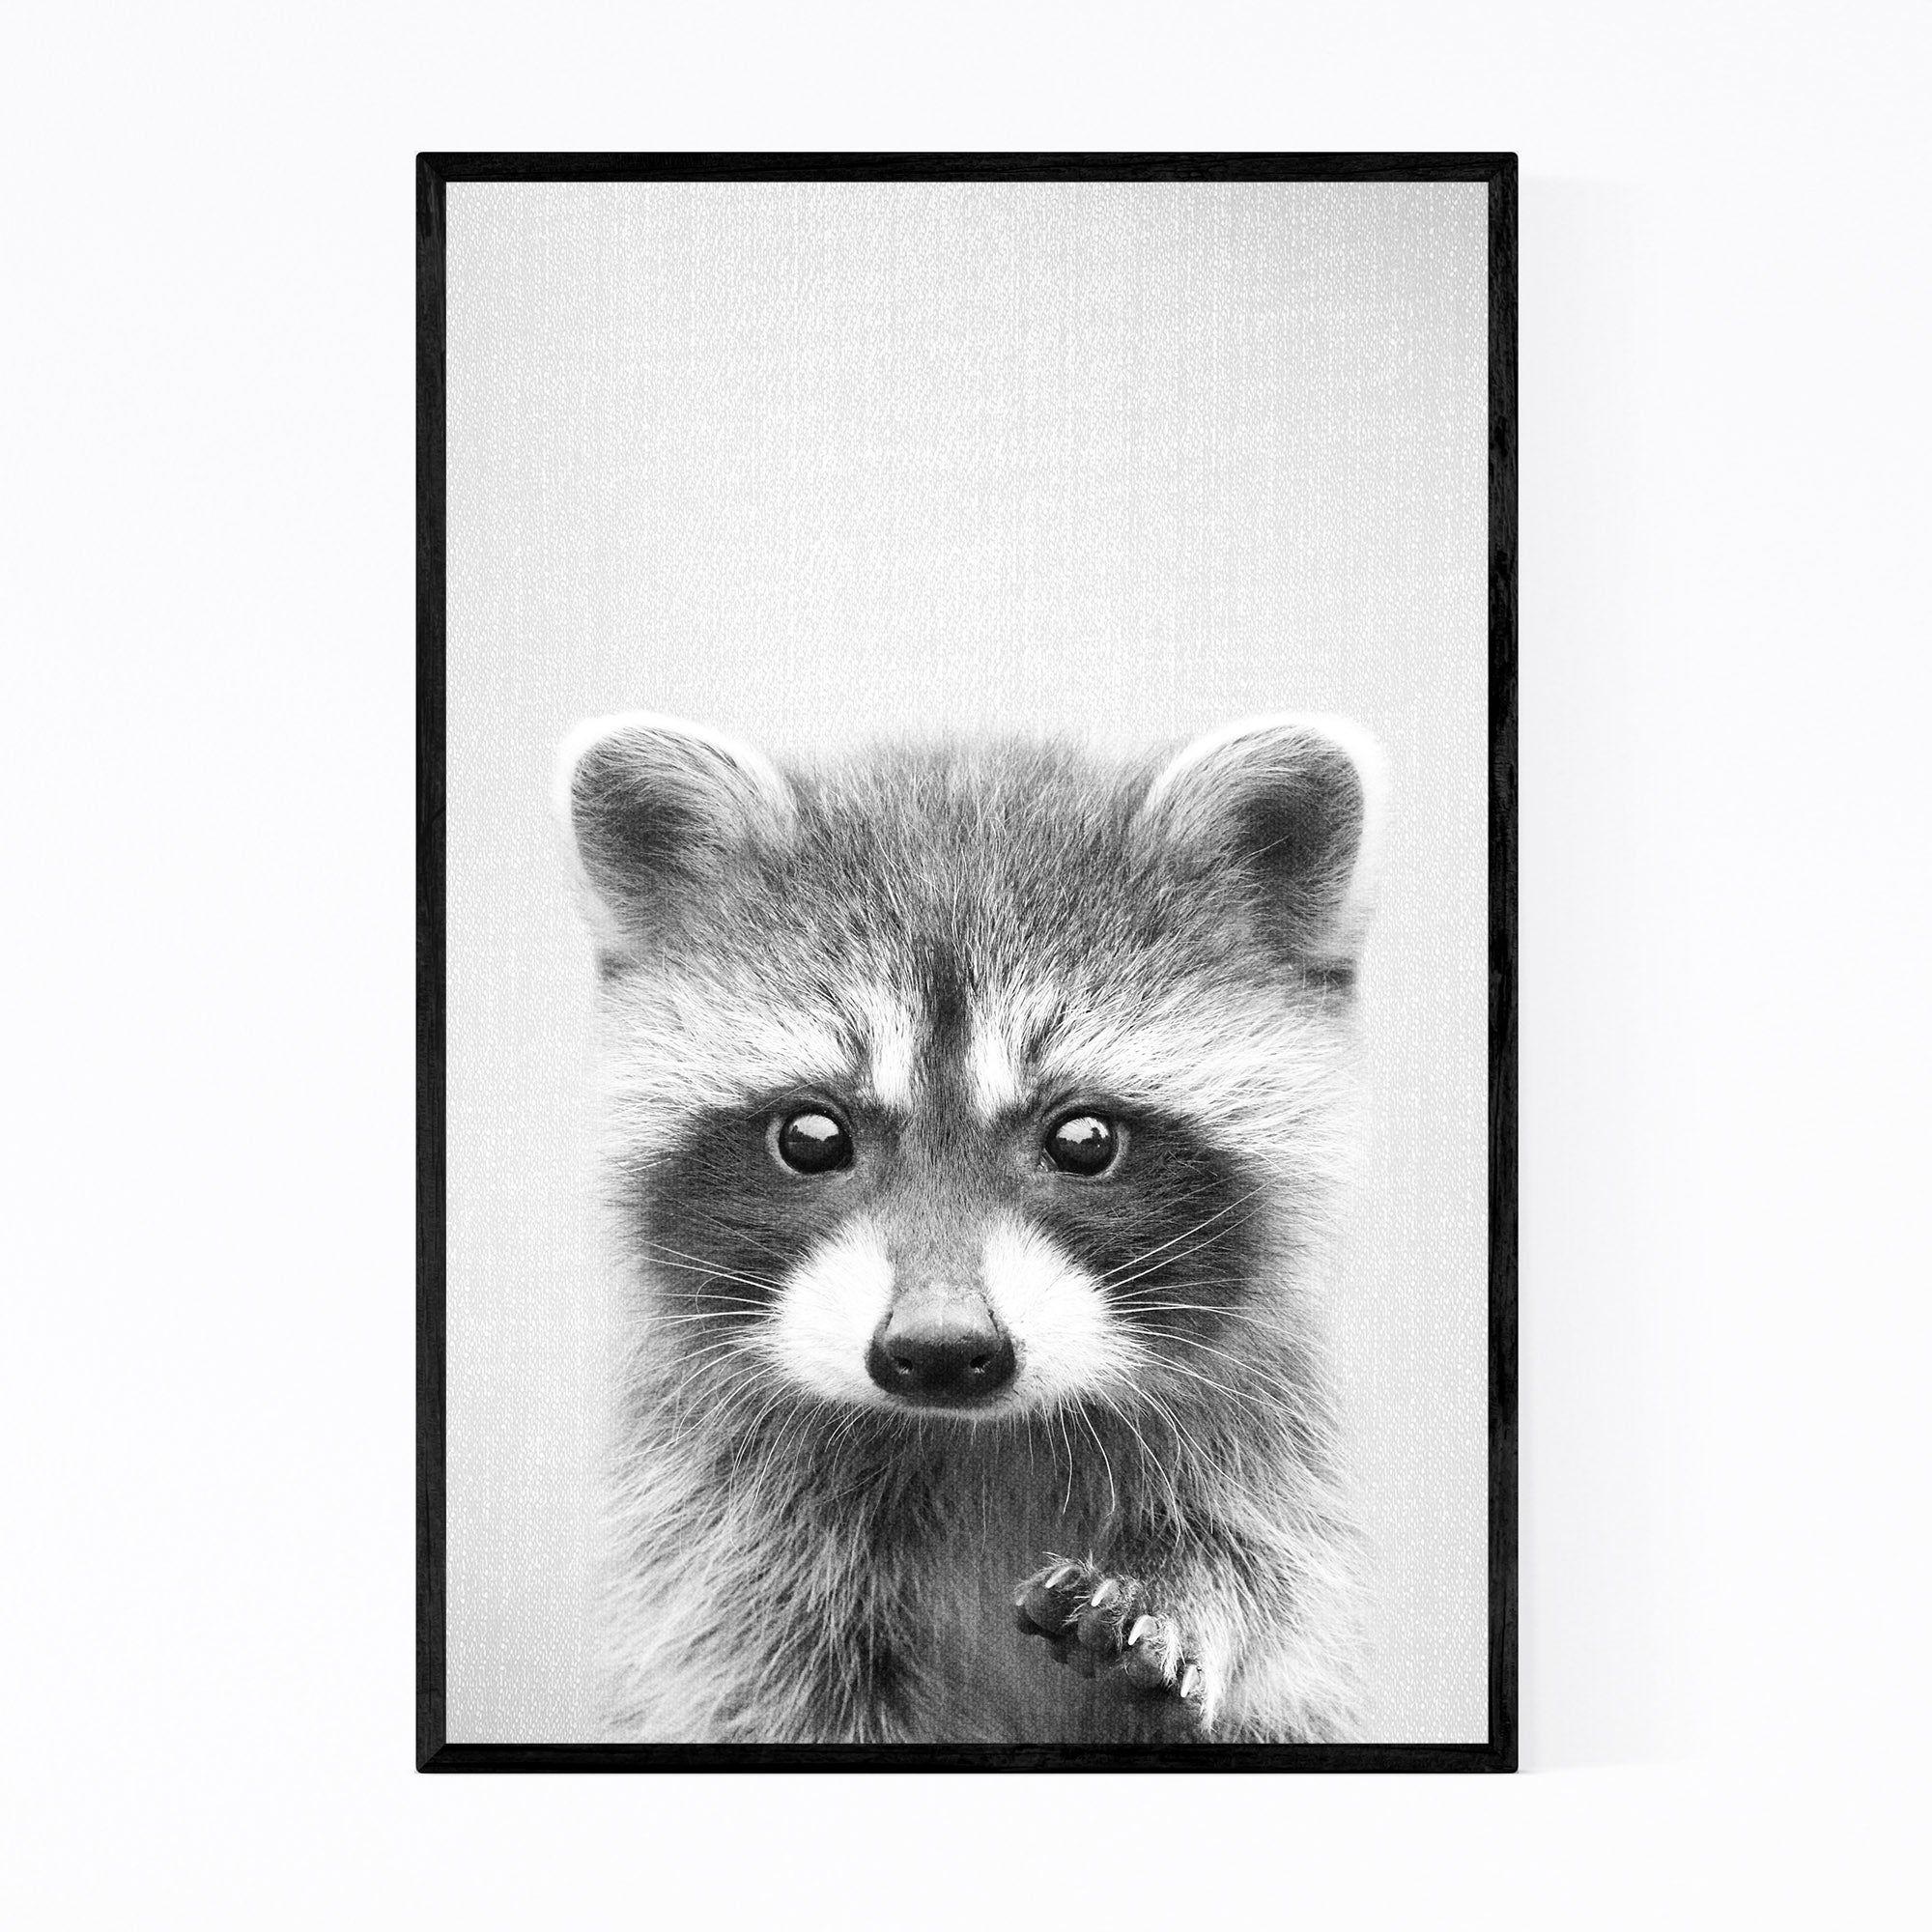 Noir Gallery Raccoon Nursery Peeking Animal Framed Art